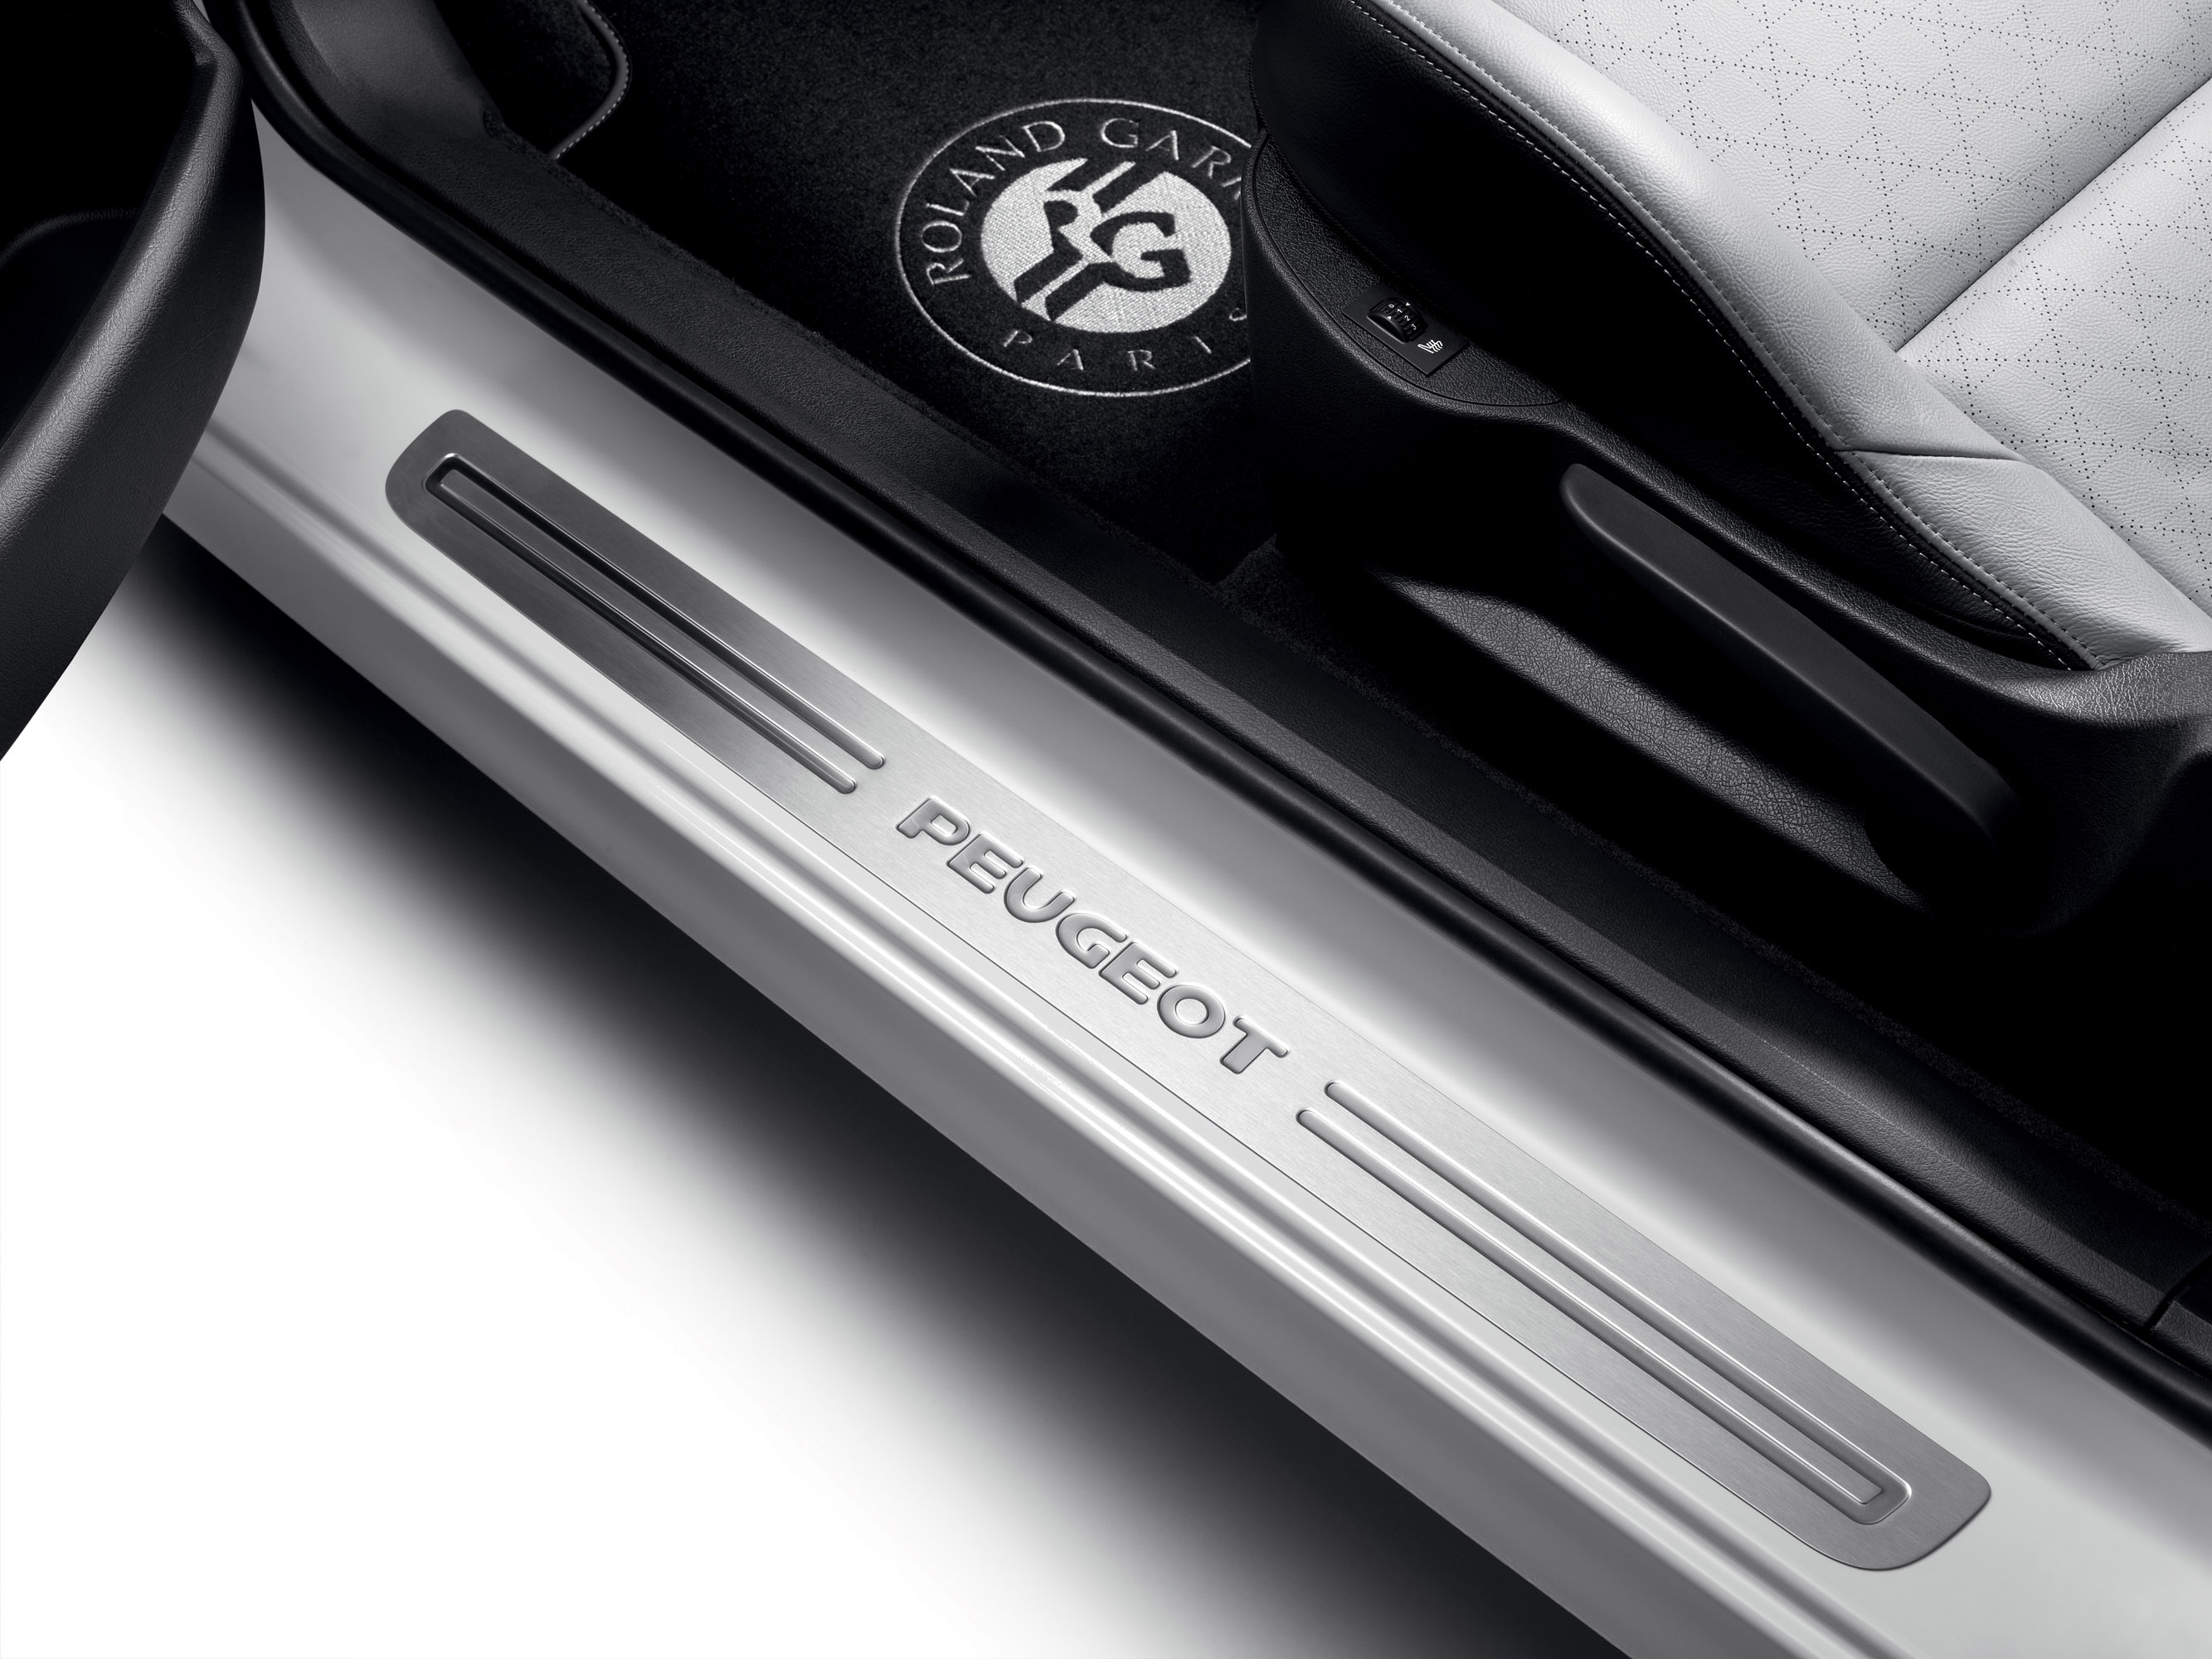 2012 peugeot 207 cc and 308 cc roland garros special editions. Black Bedroom Furniture Sets. Home Design Ideas